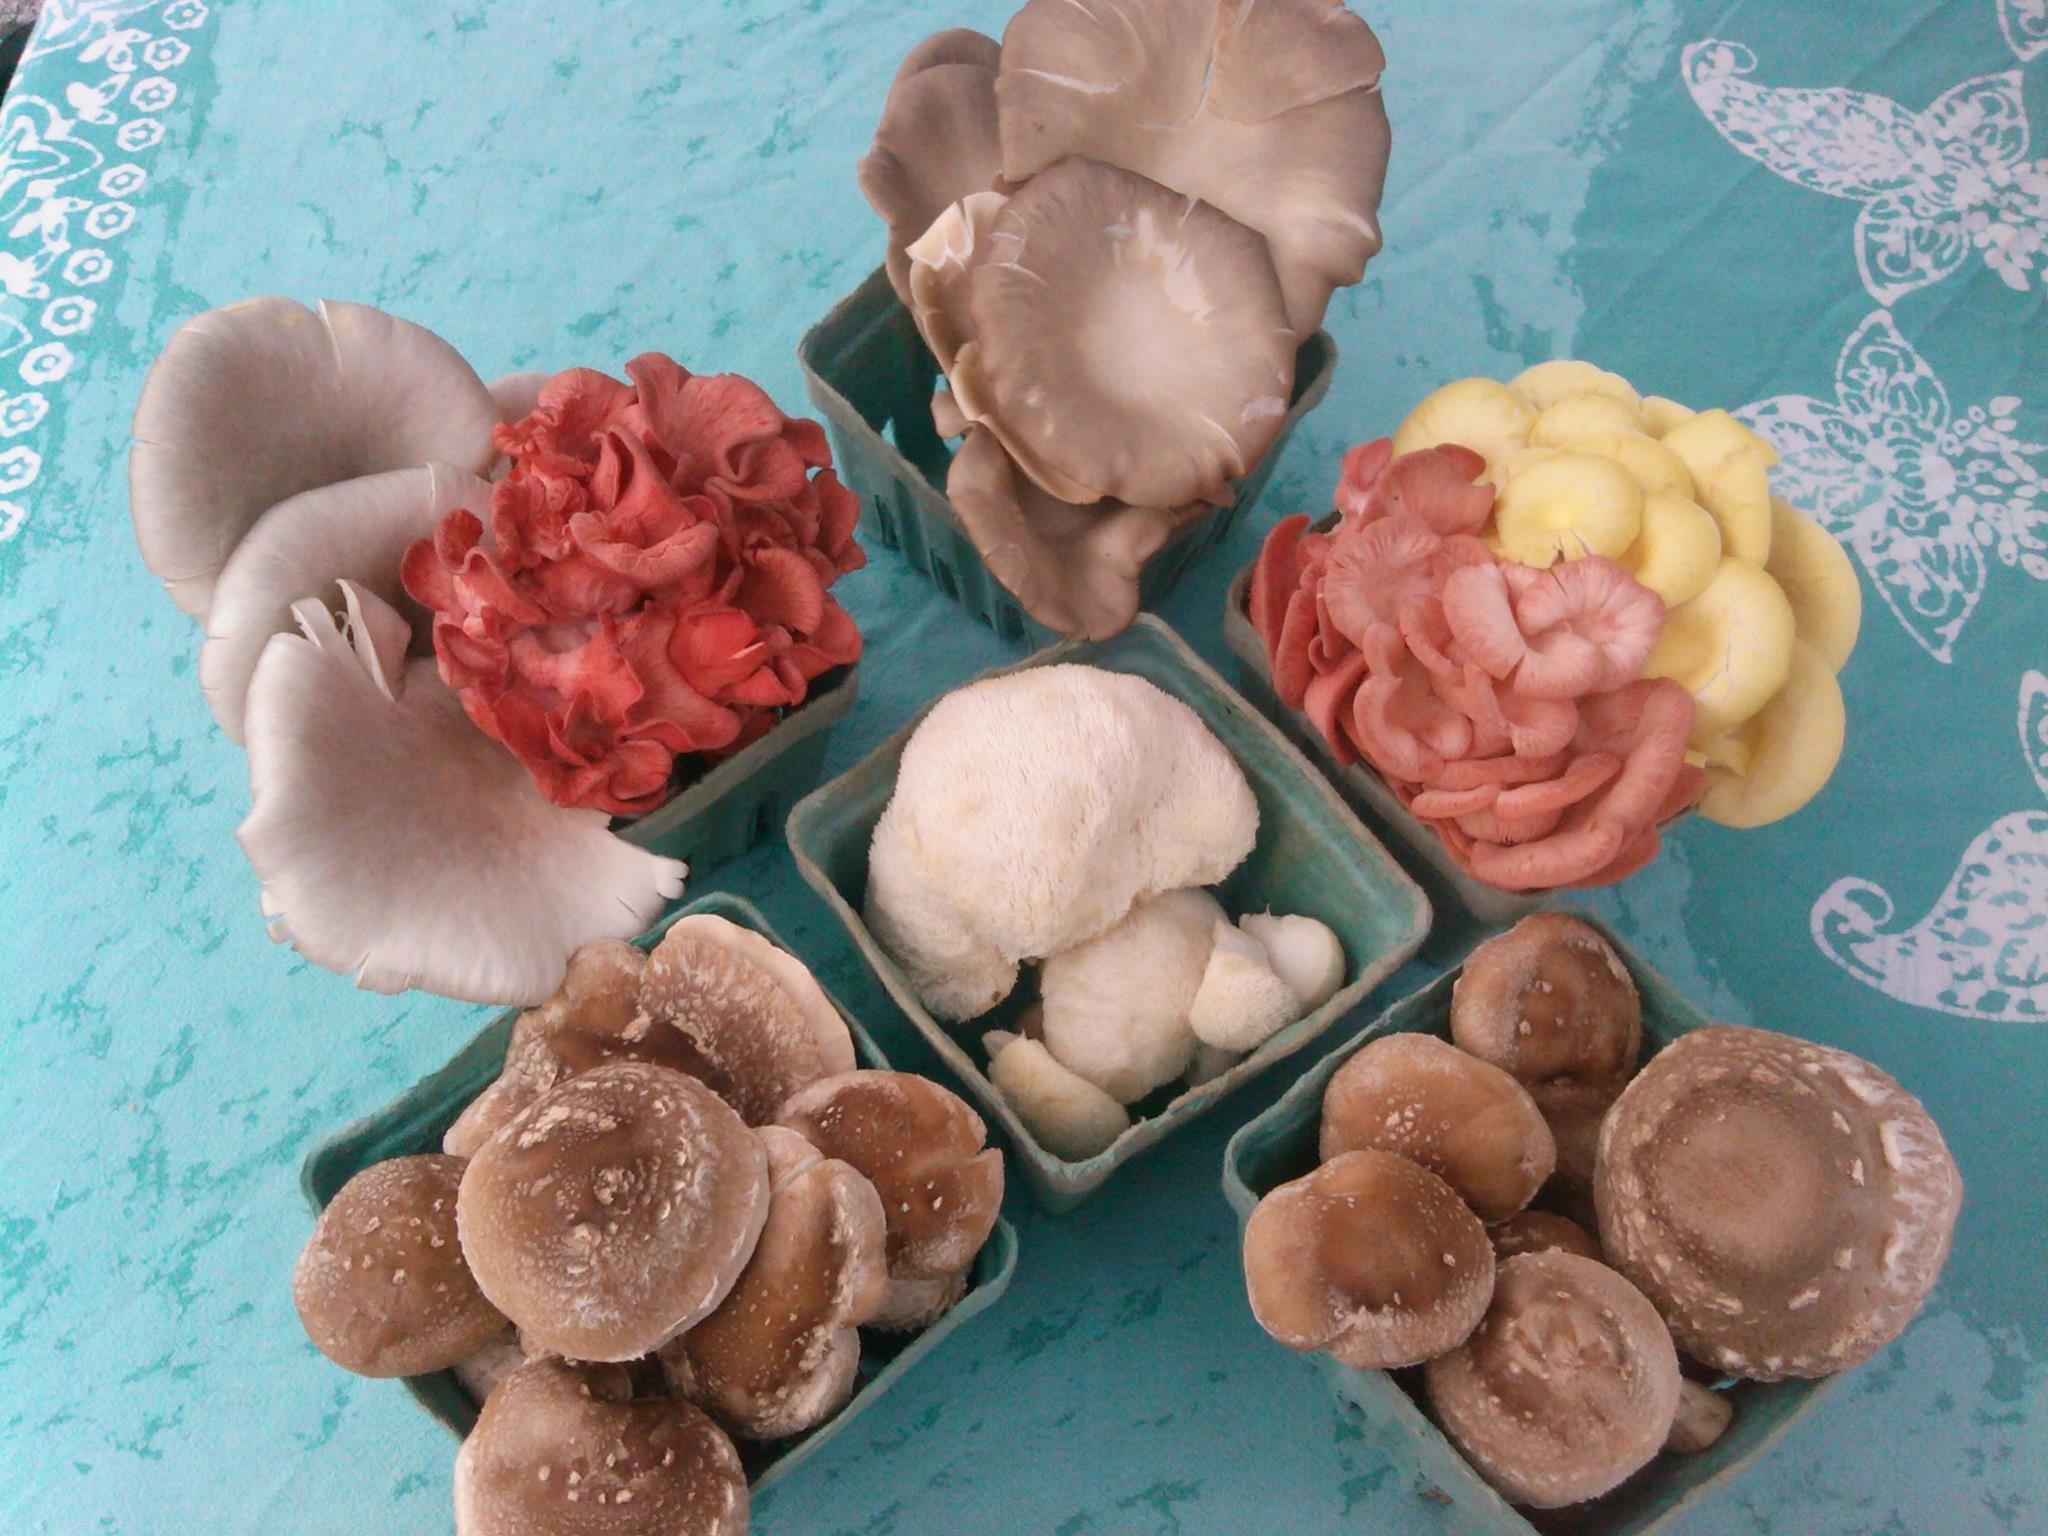 Fat_Top_Mushrooms_CNG.jpg